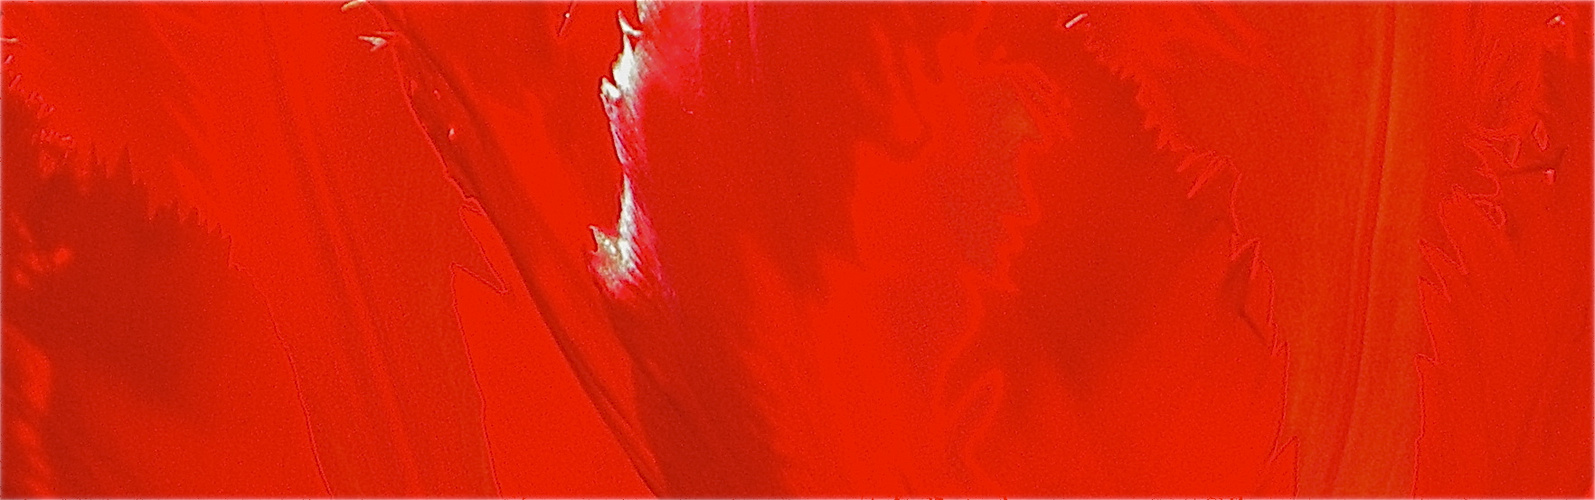 verspätetes Osterfeuer - Papageientulpe als Detail